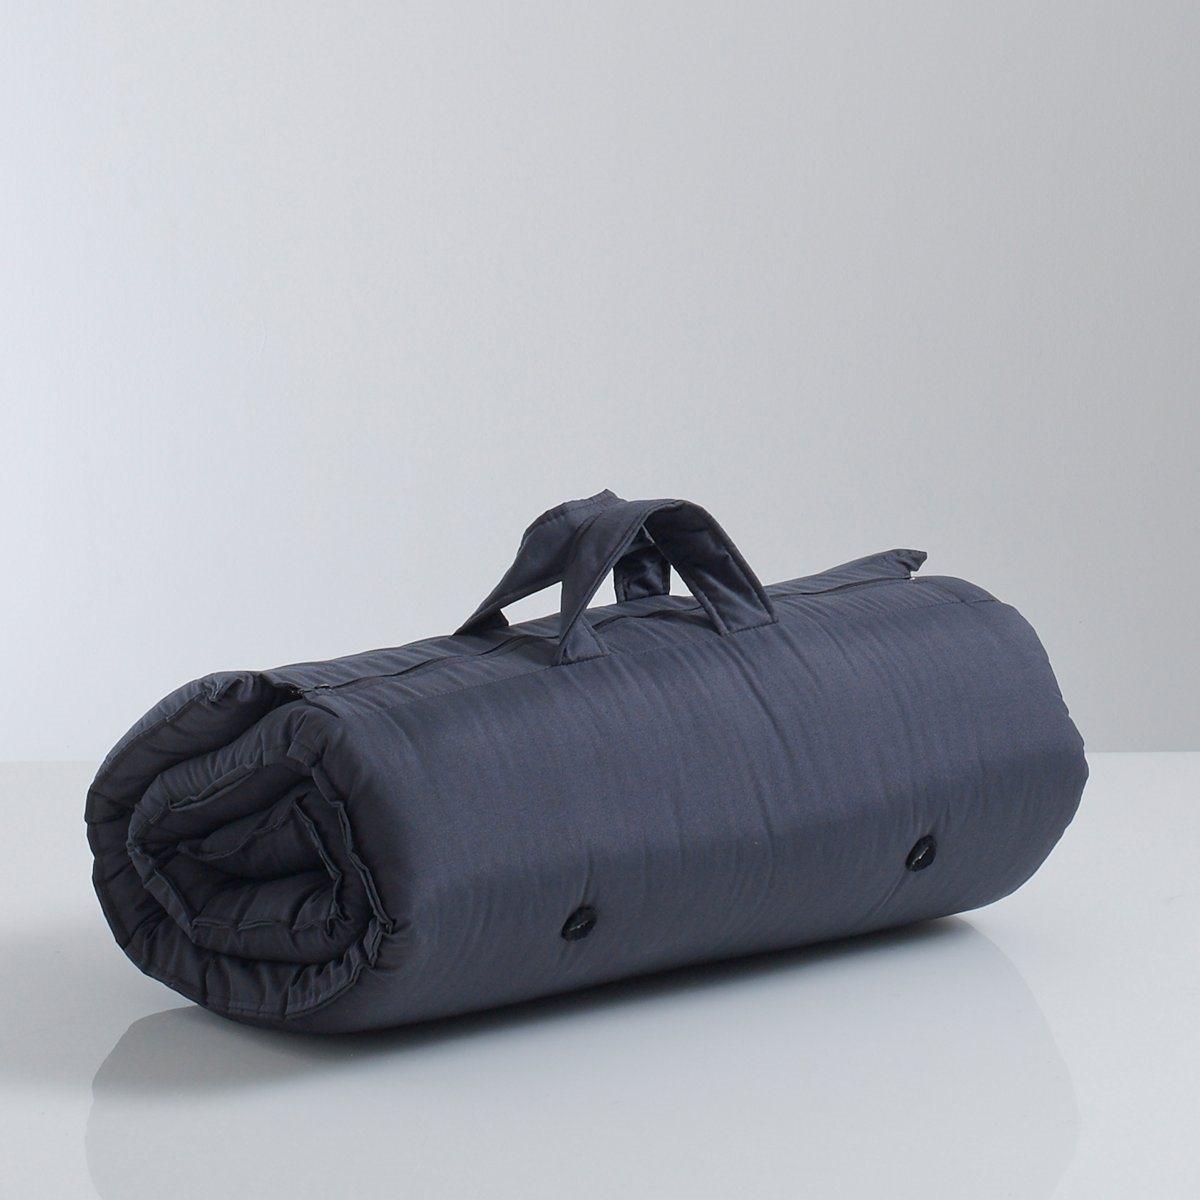 Colchón futón nómada